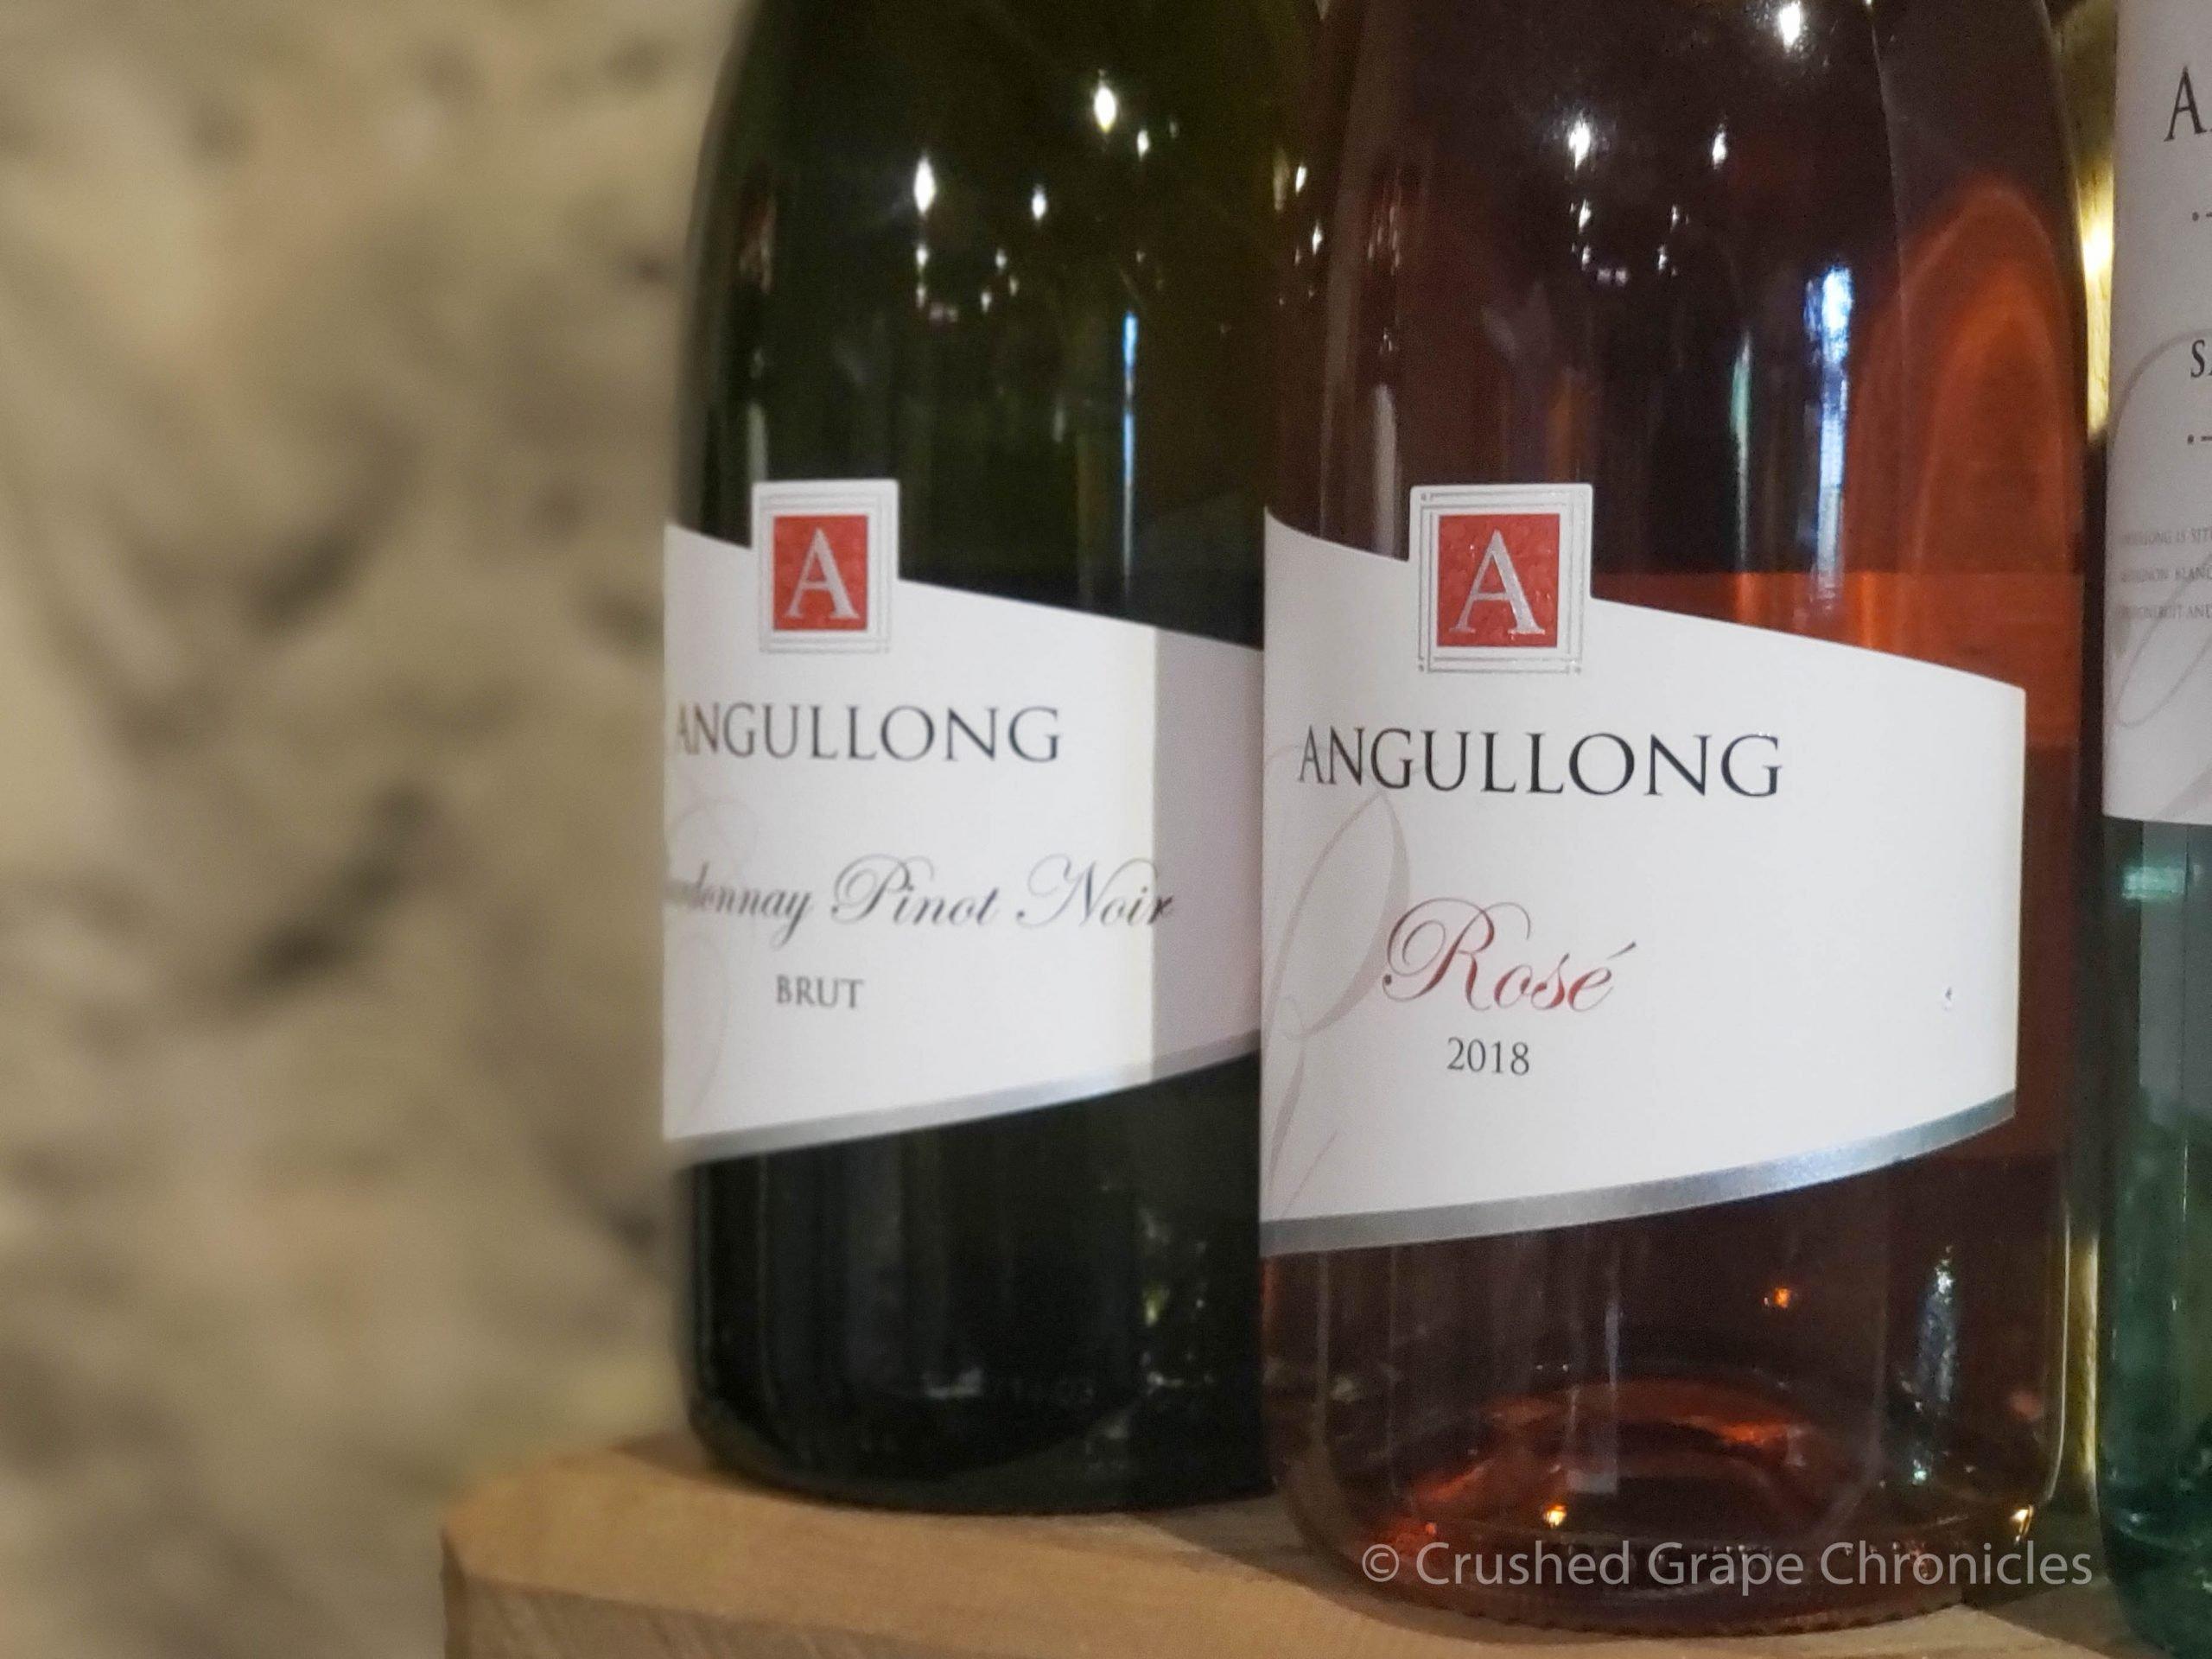 Angullong Rose and Chardonnay Pinot Noir Brut at Angullong Vineyard in Cellar Door in Millthorpe, Orange NSW Australia